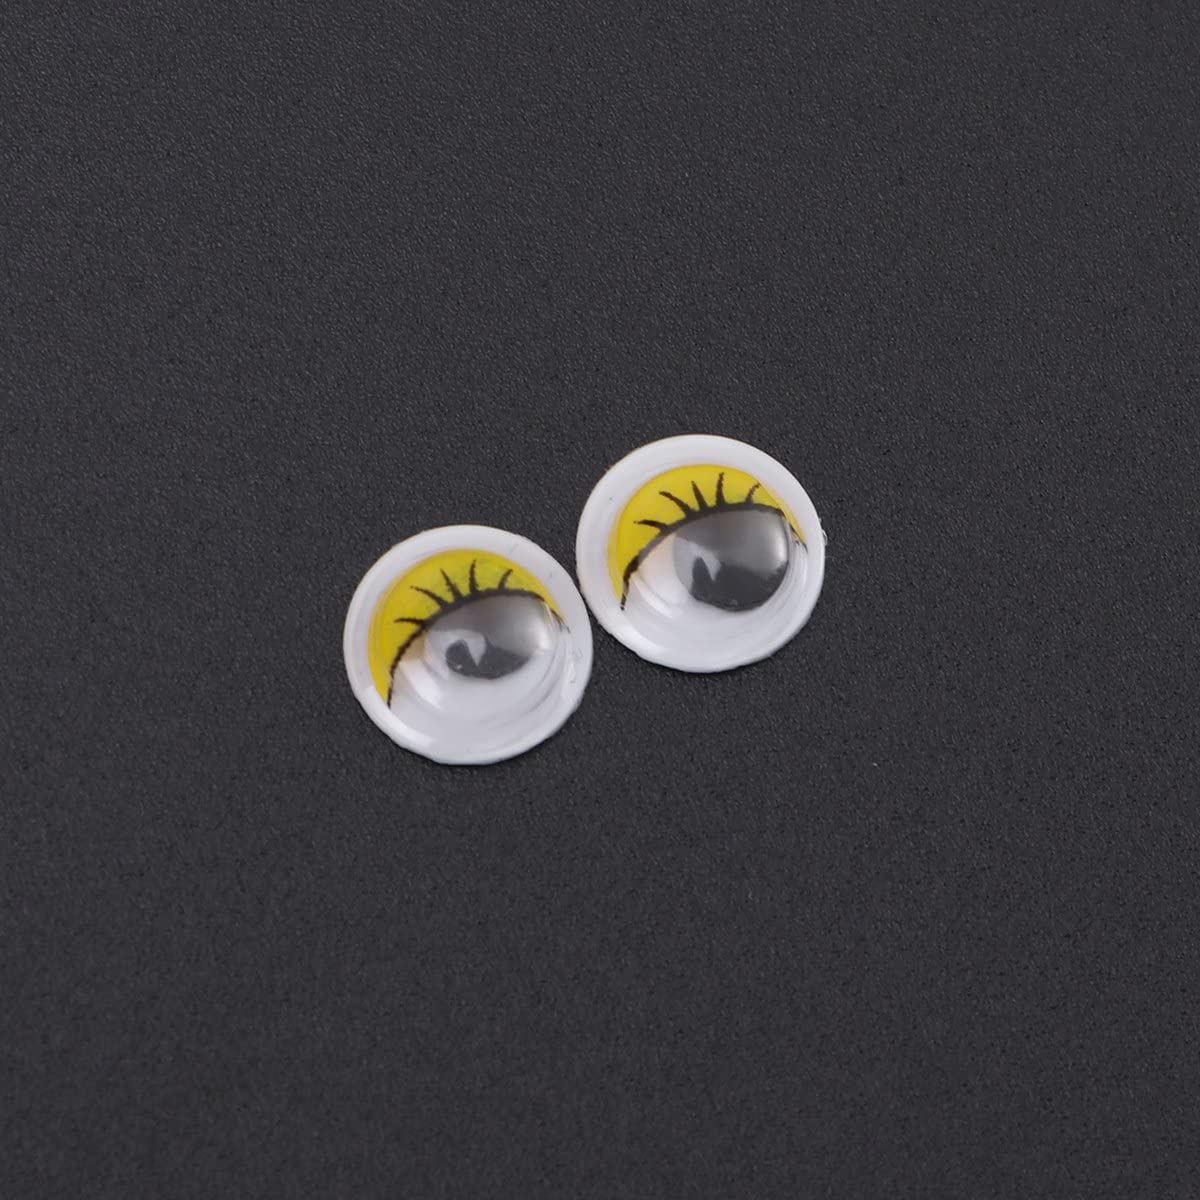 STOBOK 100Pcs Wackelaugen Kulleraugen Klebeaugen Selbstklebende Googly Augen DIY Scrapbooking Kunsthandwerk Augen 12mm Gelb